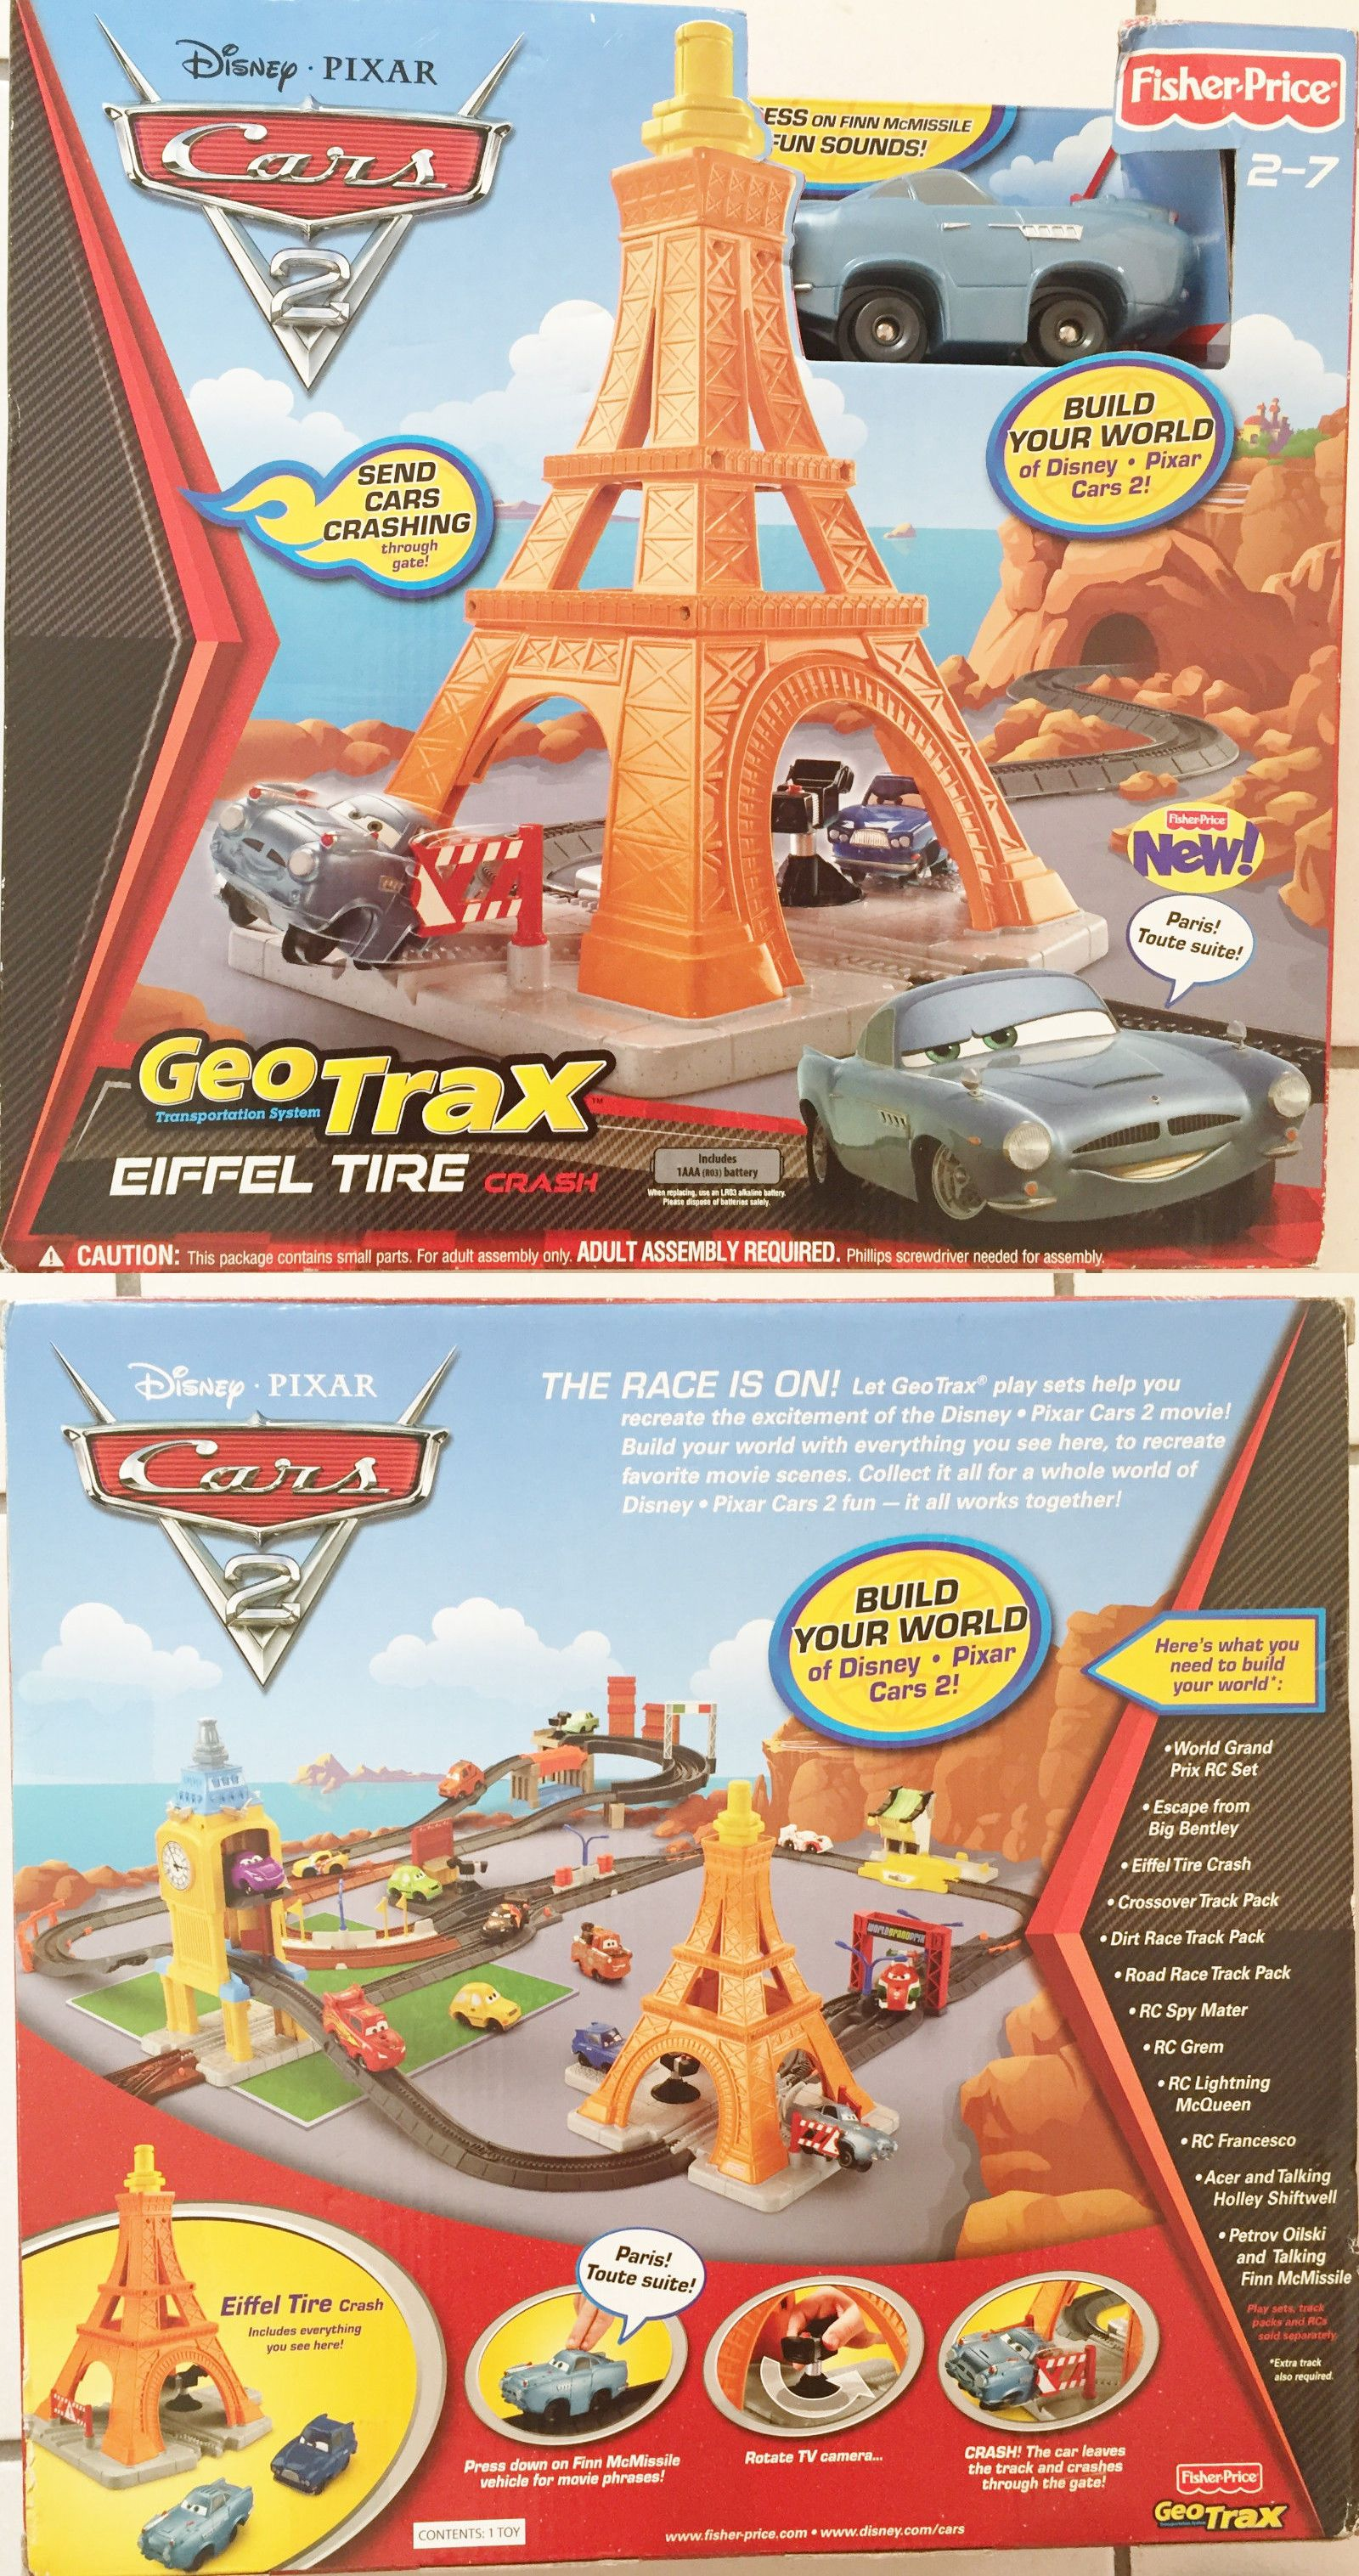 Geotrax 158742 fisher price geotrax disney pixar cars 2 eiffel tire crash 2